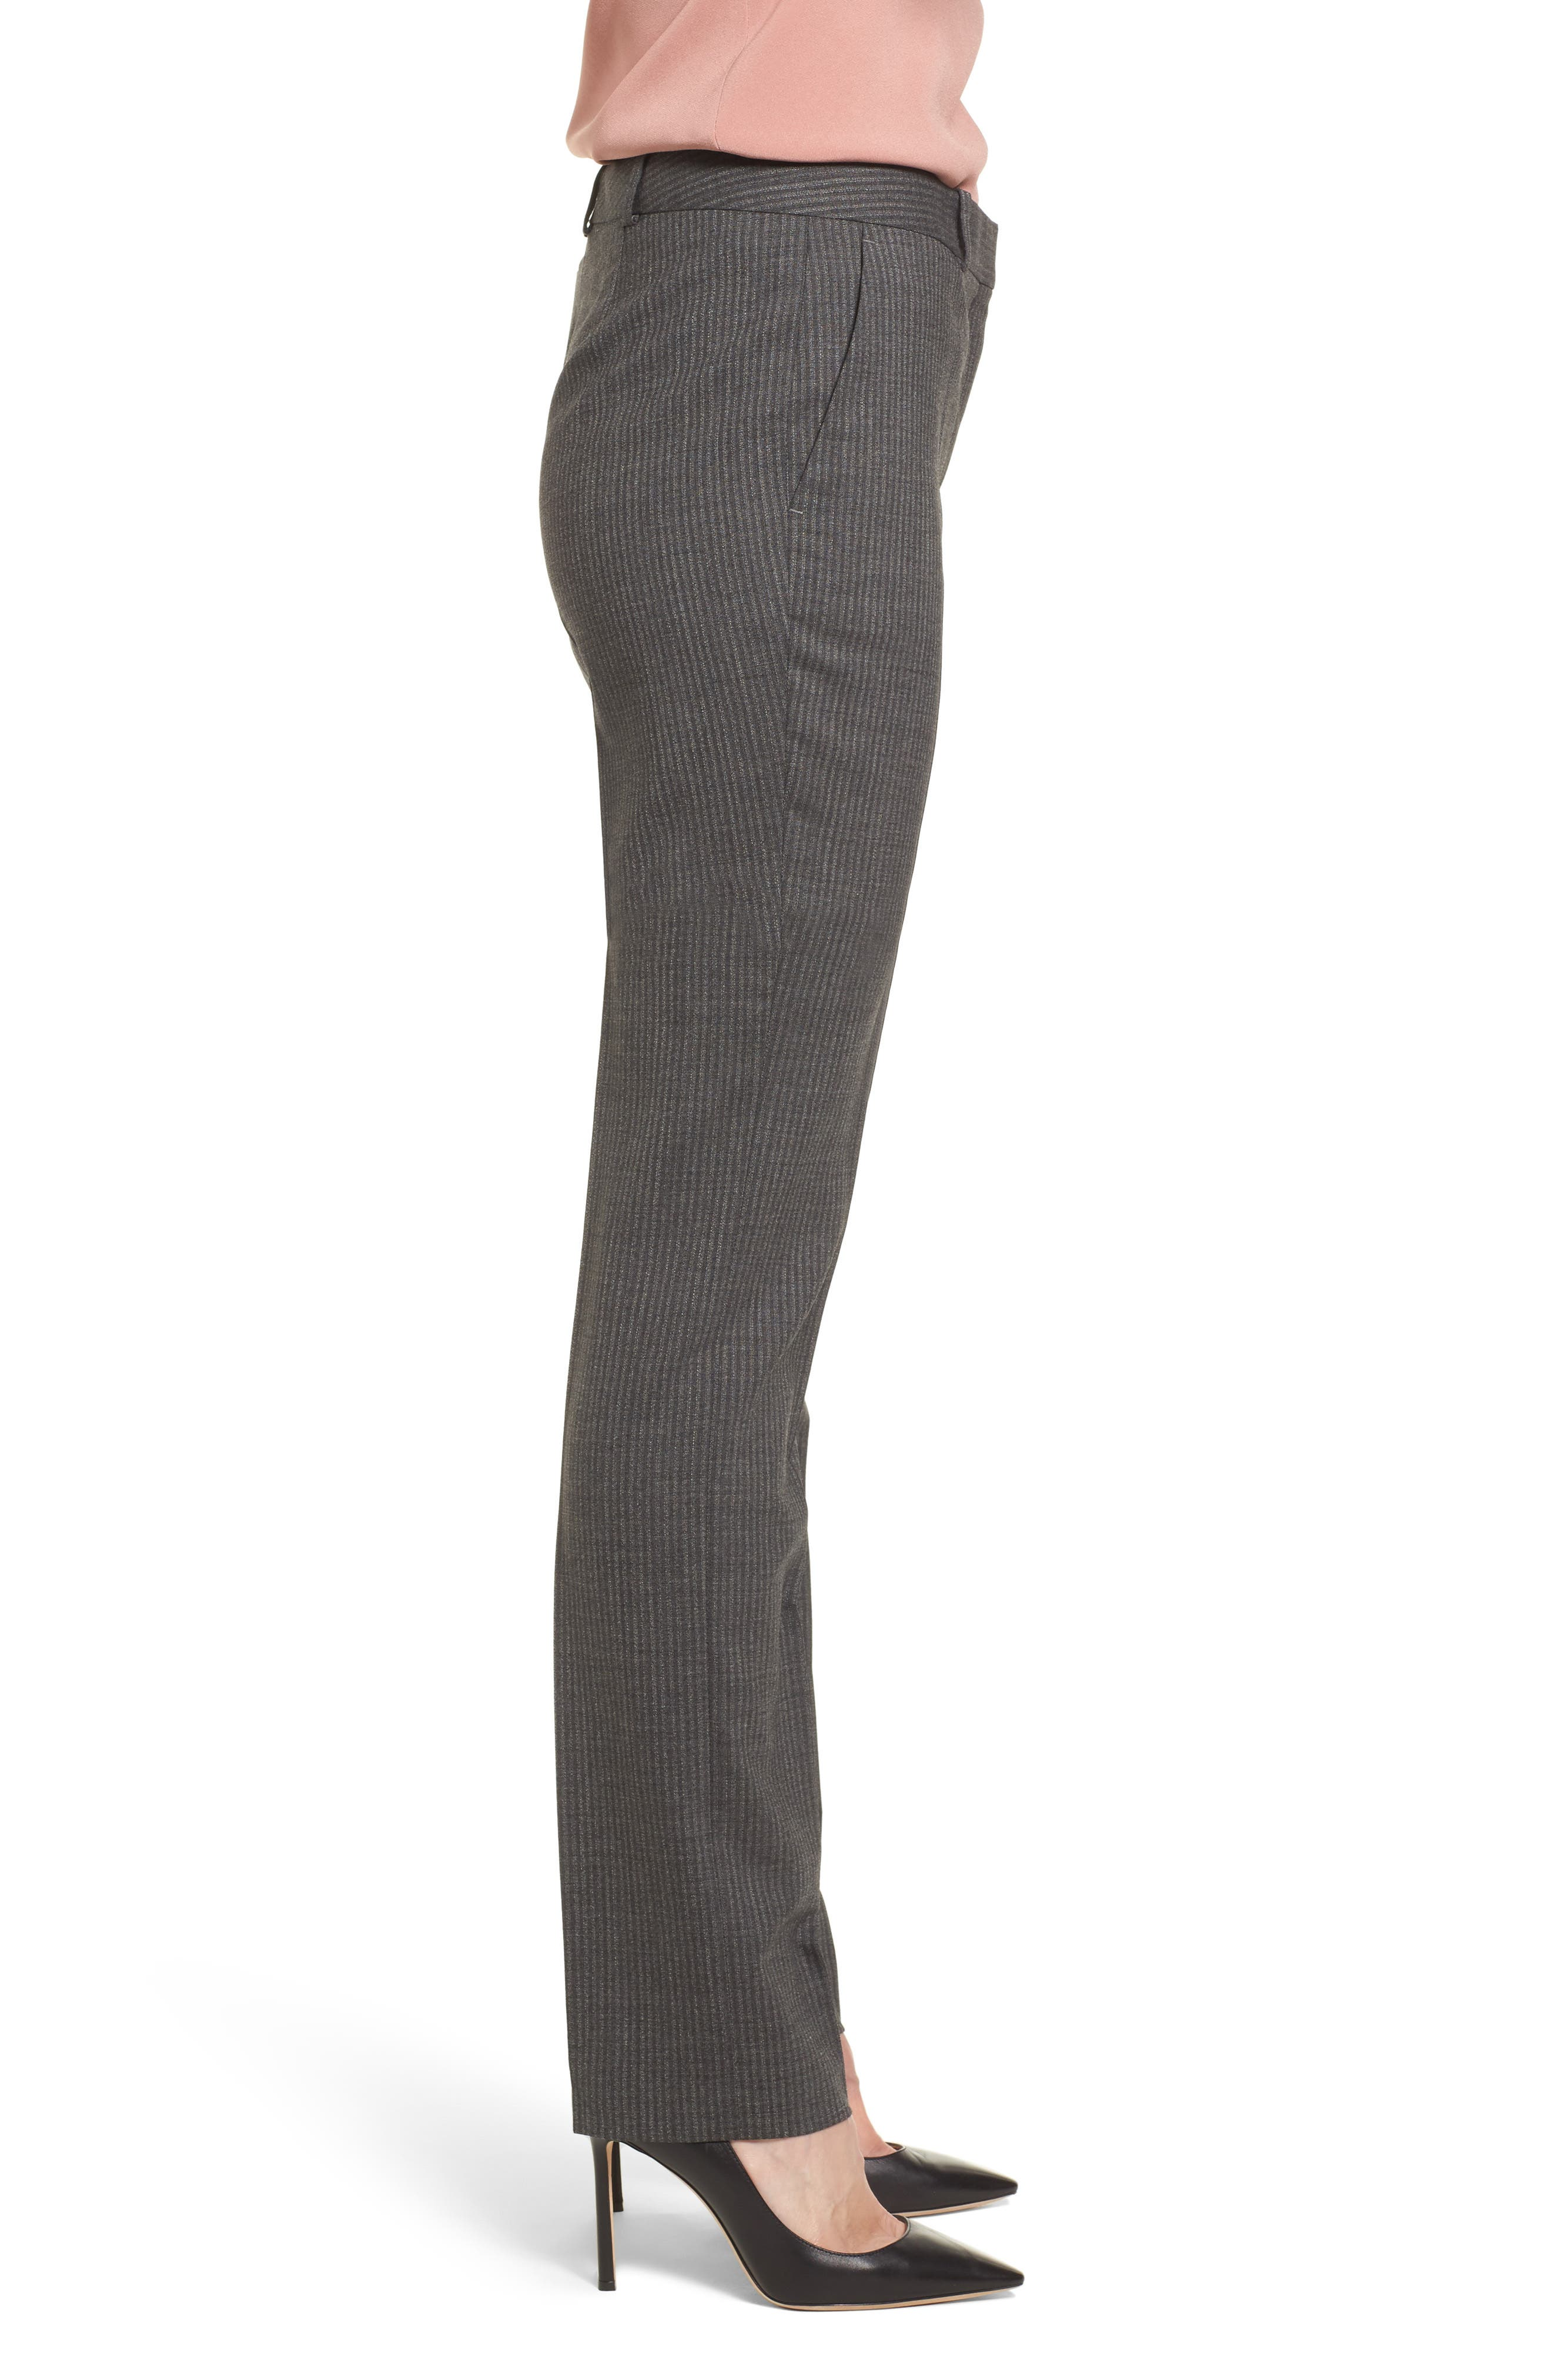 Titana Stretch Wool Trousers,                             Alternate thumbnail 3, color,                             Dark Grey Fantasy